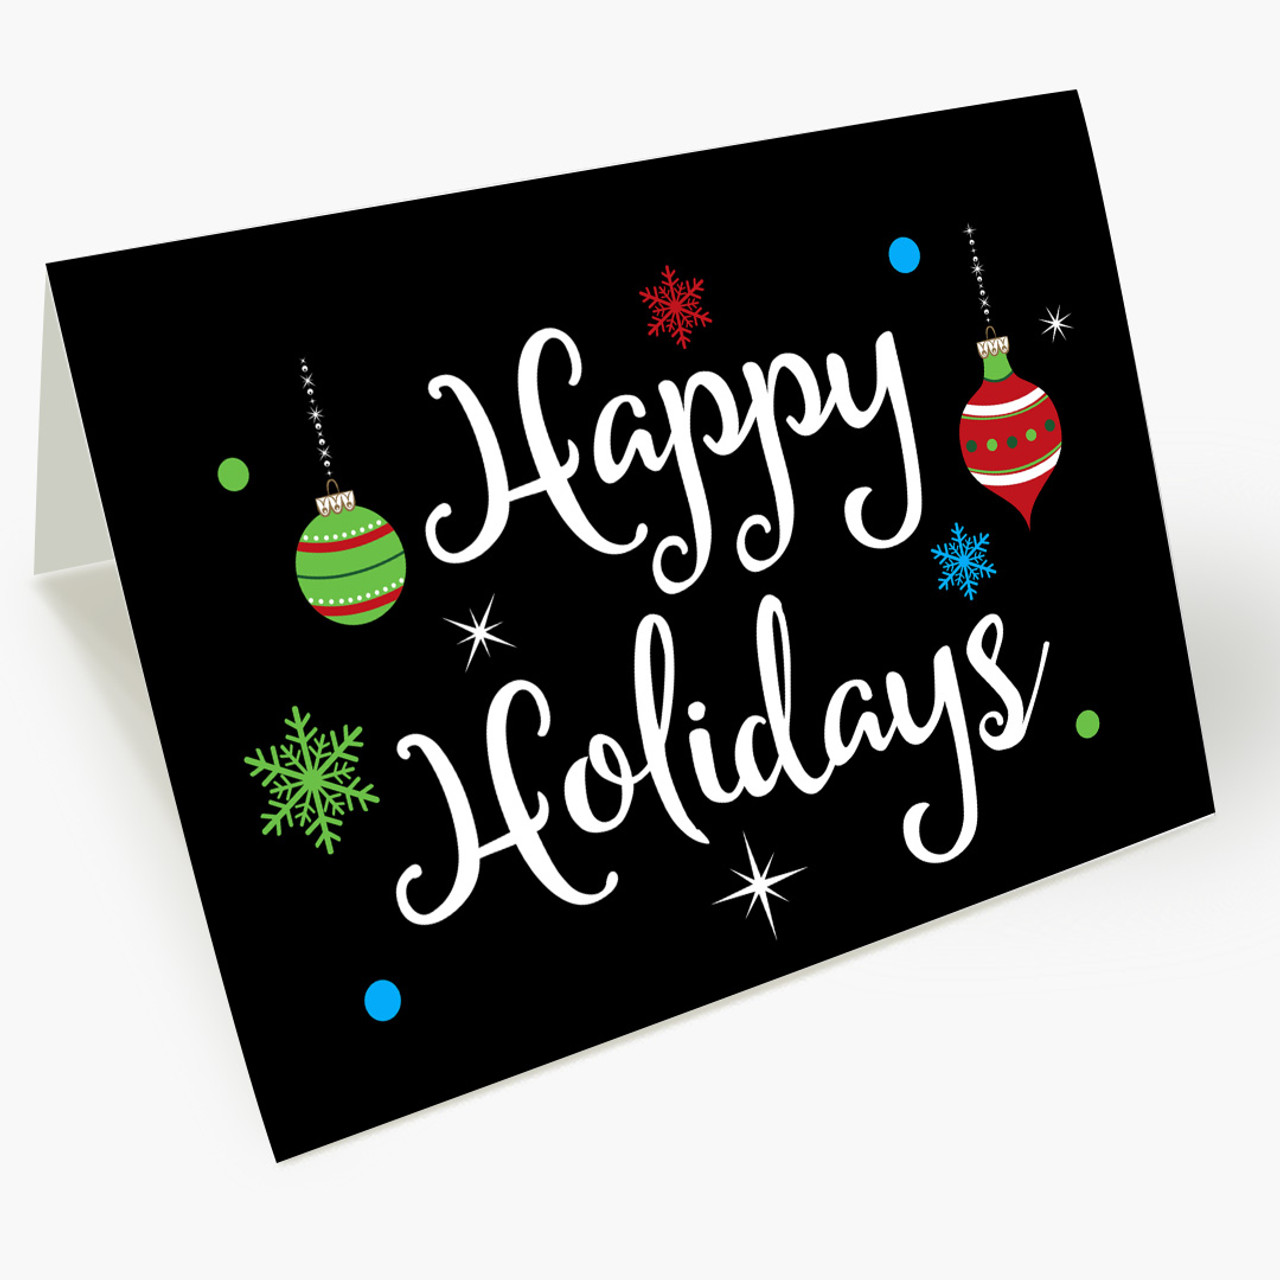 Cheerful Greetings Christmas Card